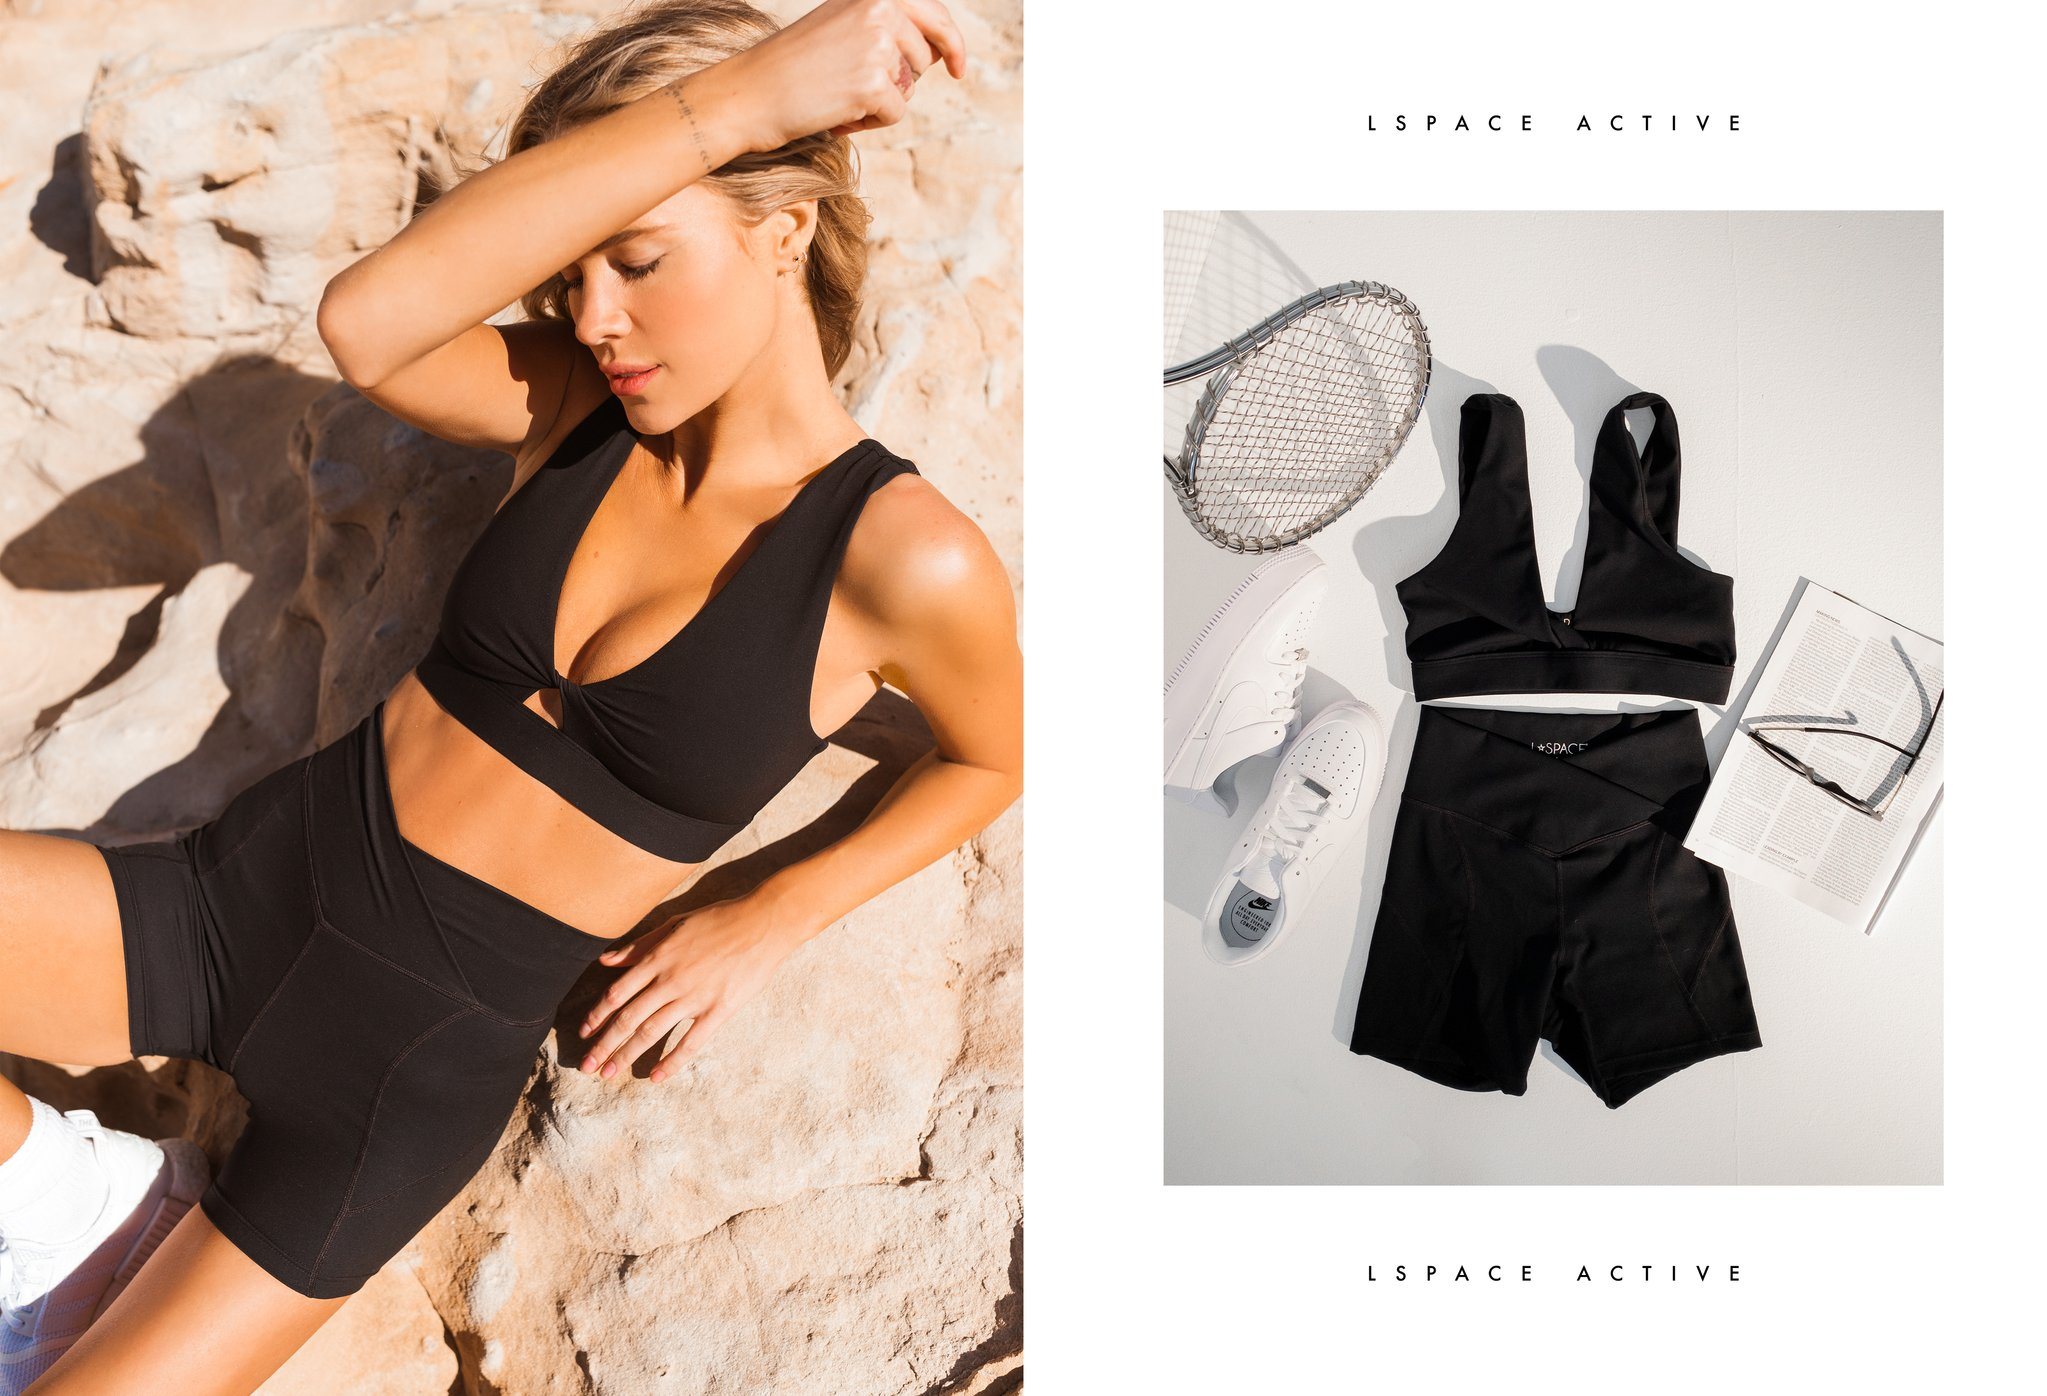 lspace activewear